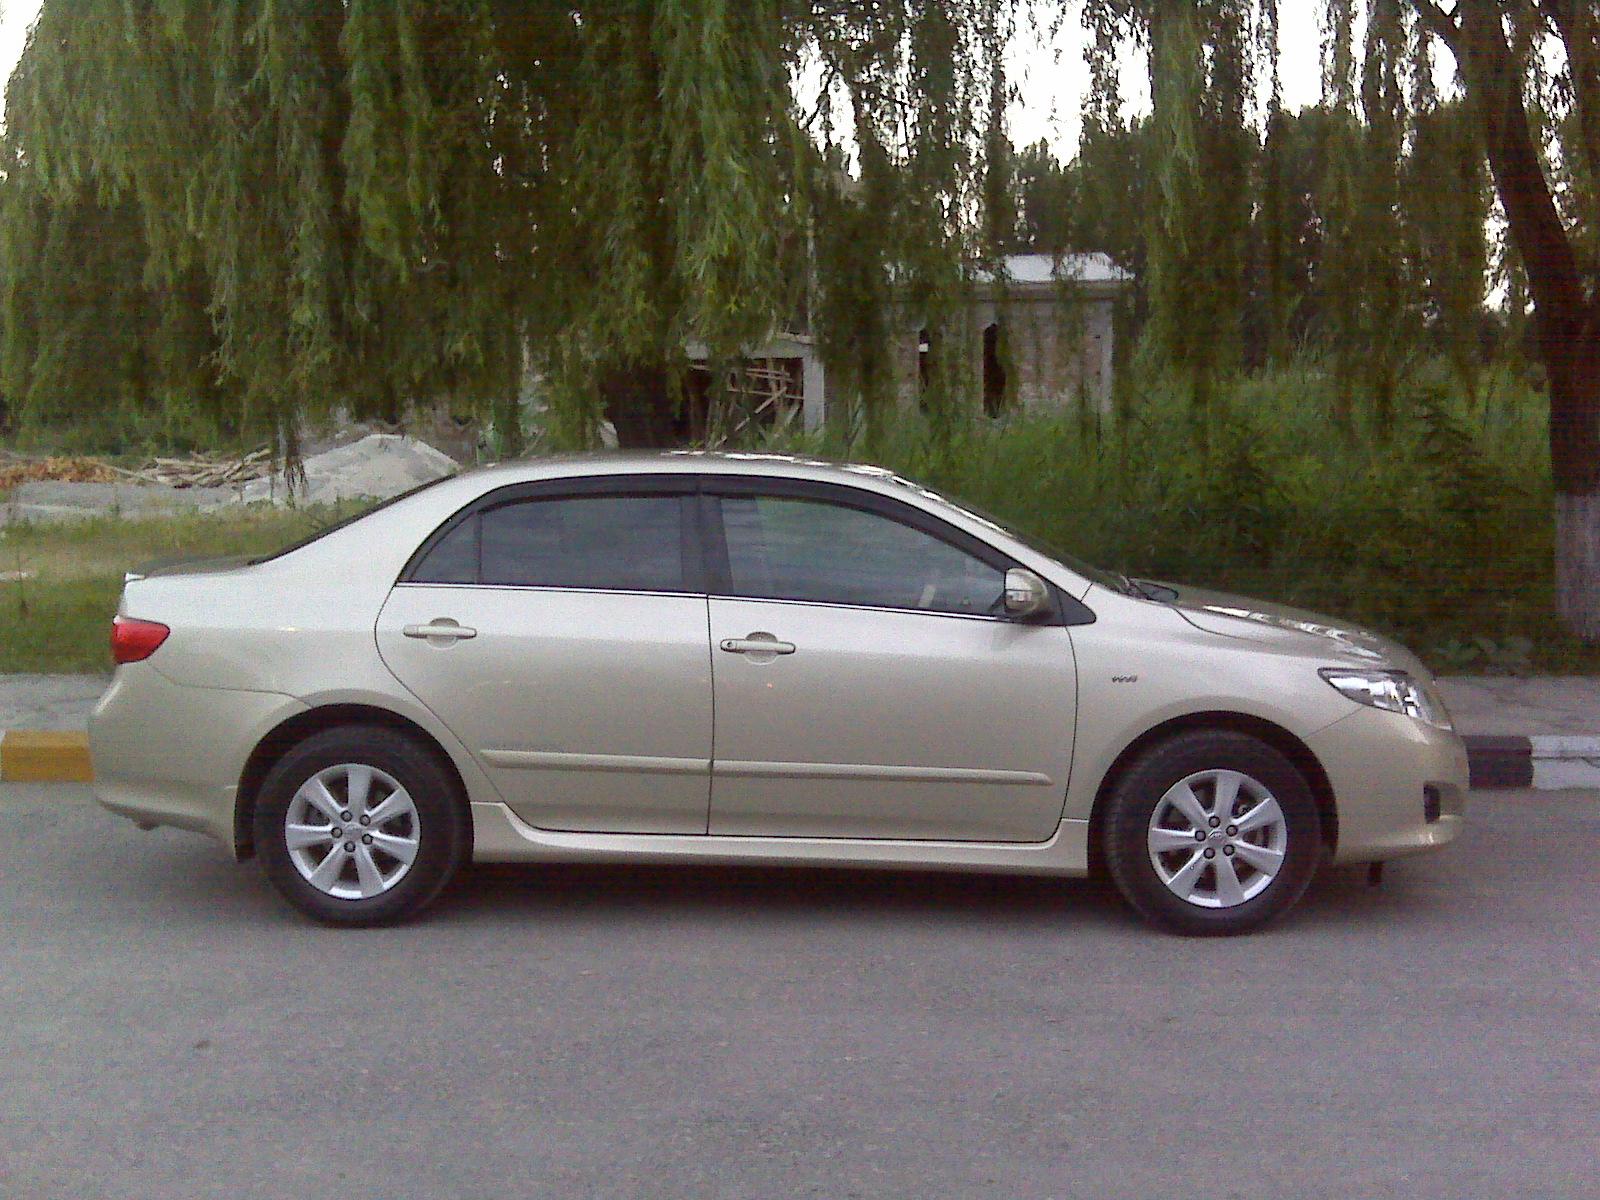 Motor Car Pictures Gli 2d Carolla